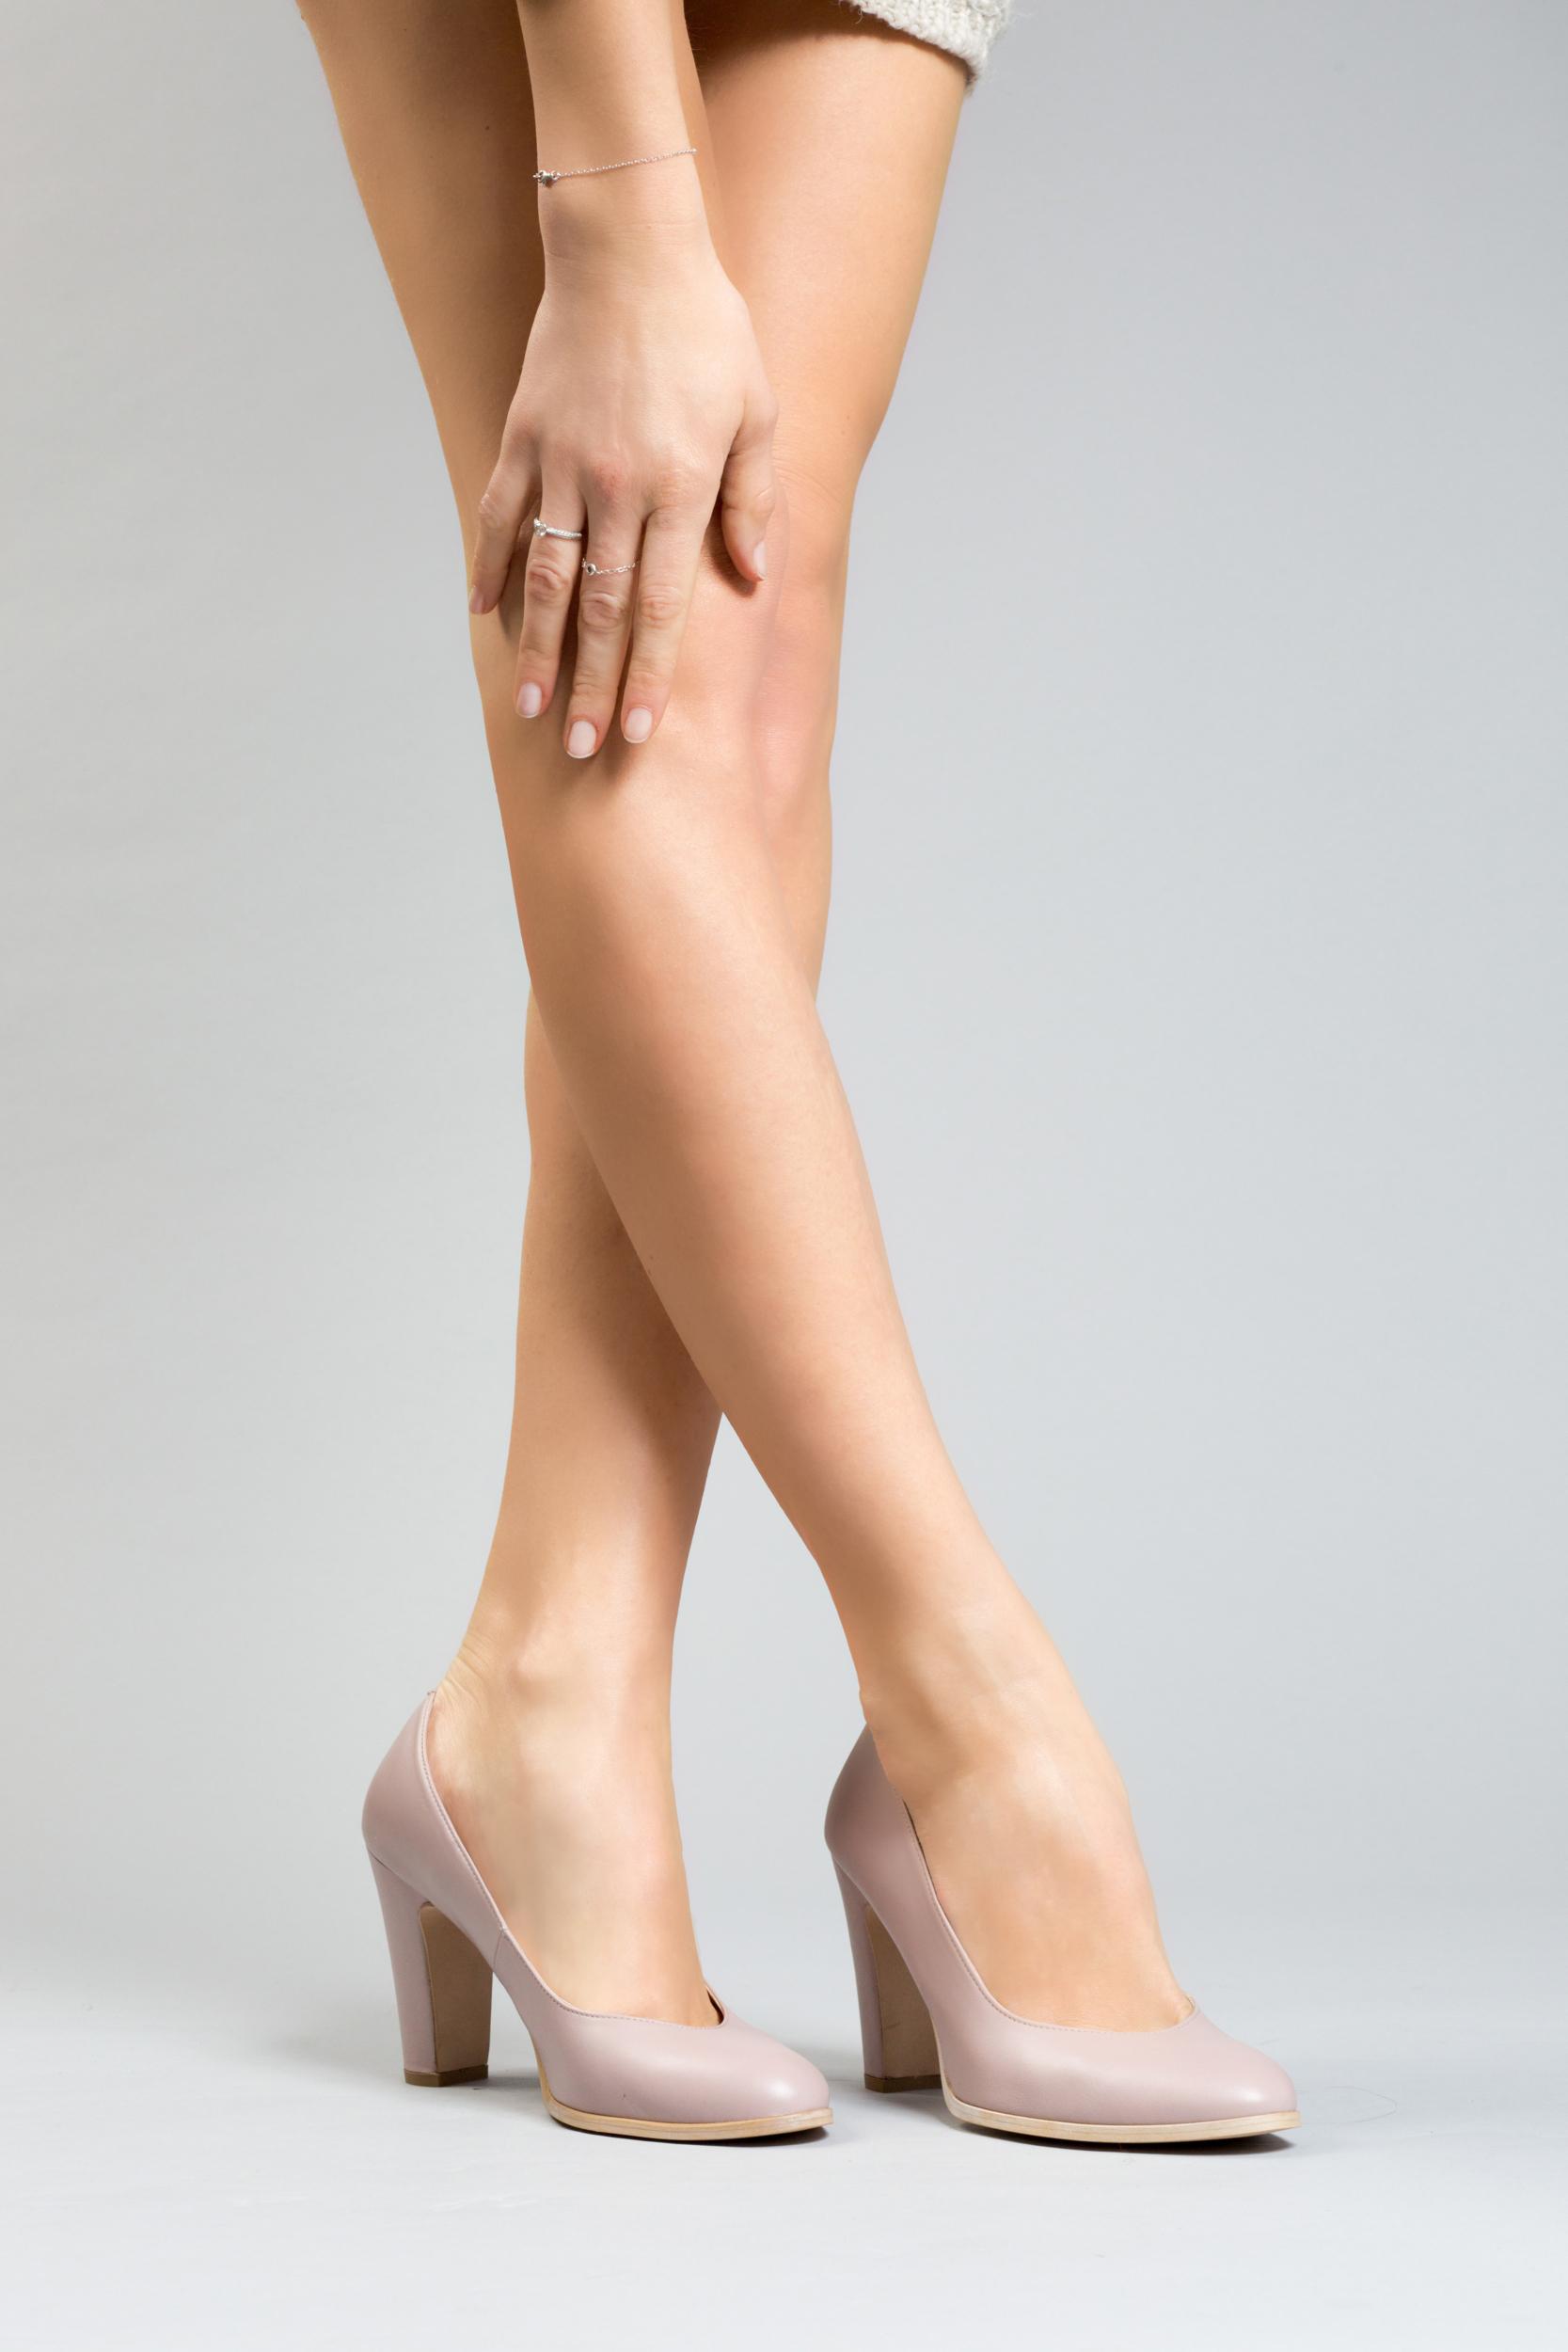 Escarpins femmes nude grande taille